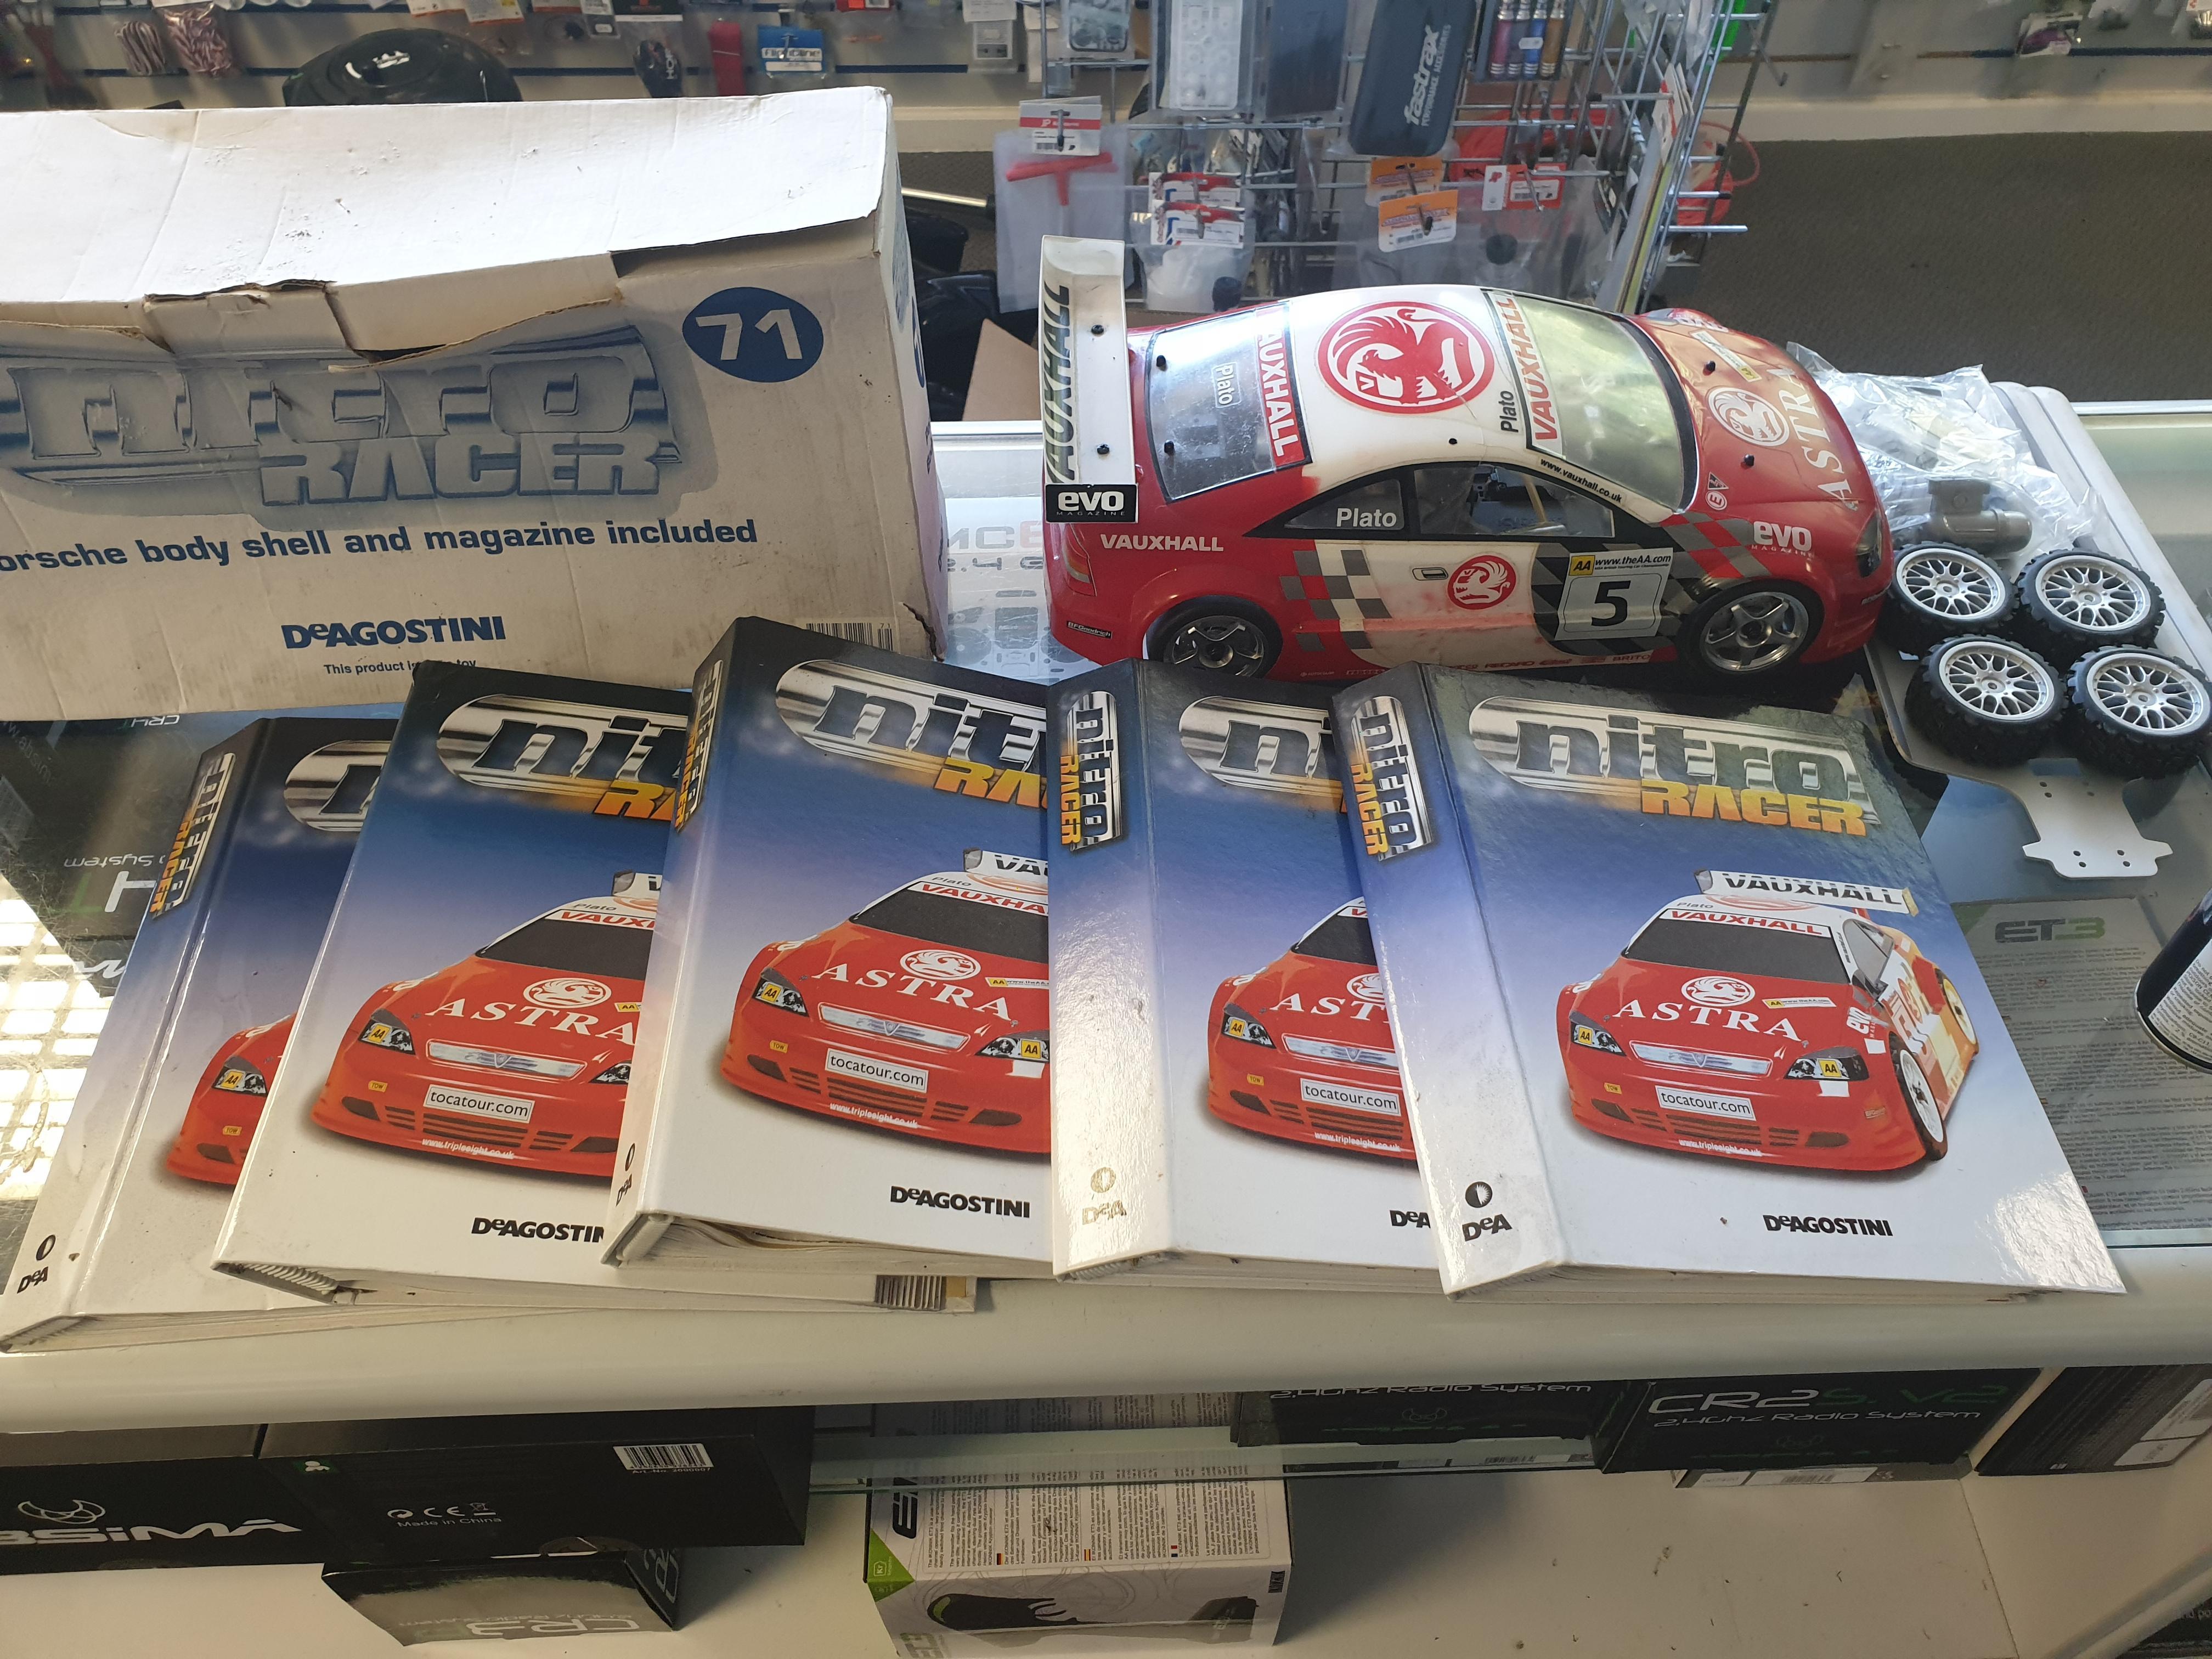 Kyosho Pureten Alpha Deagostini Astra RC Touring Car Nitro Racer Vauxhall 1/10